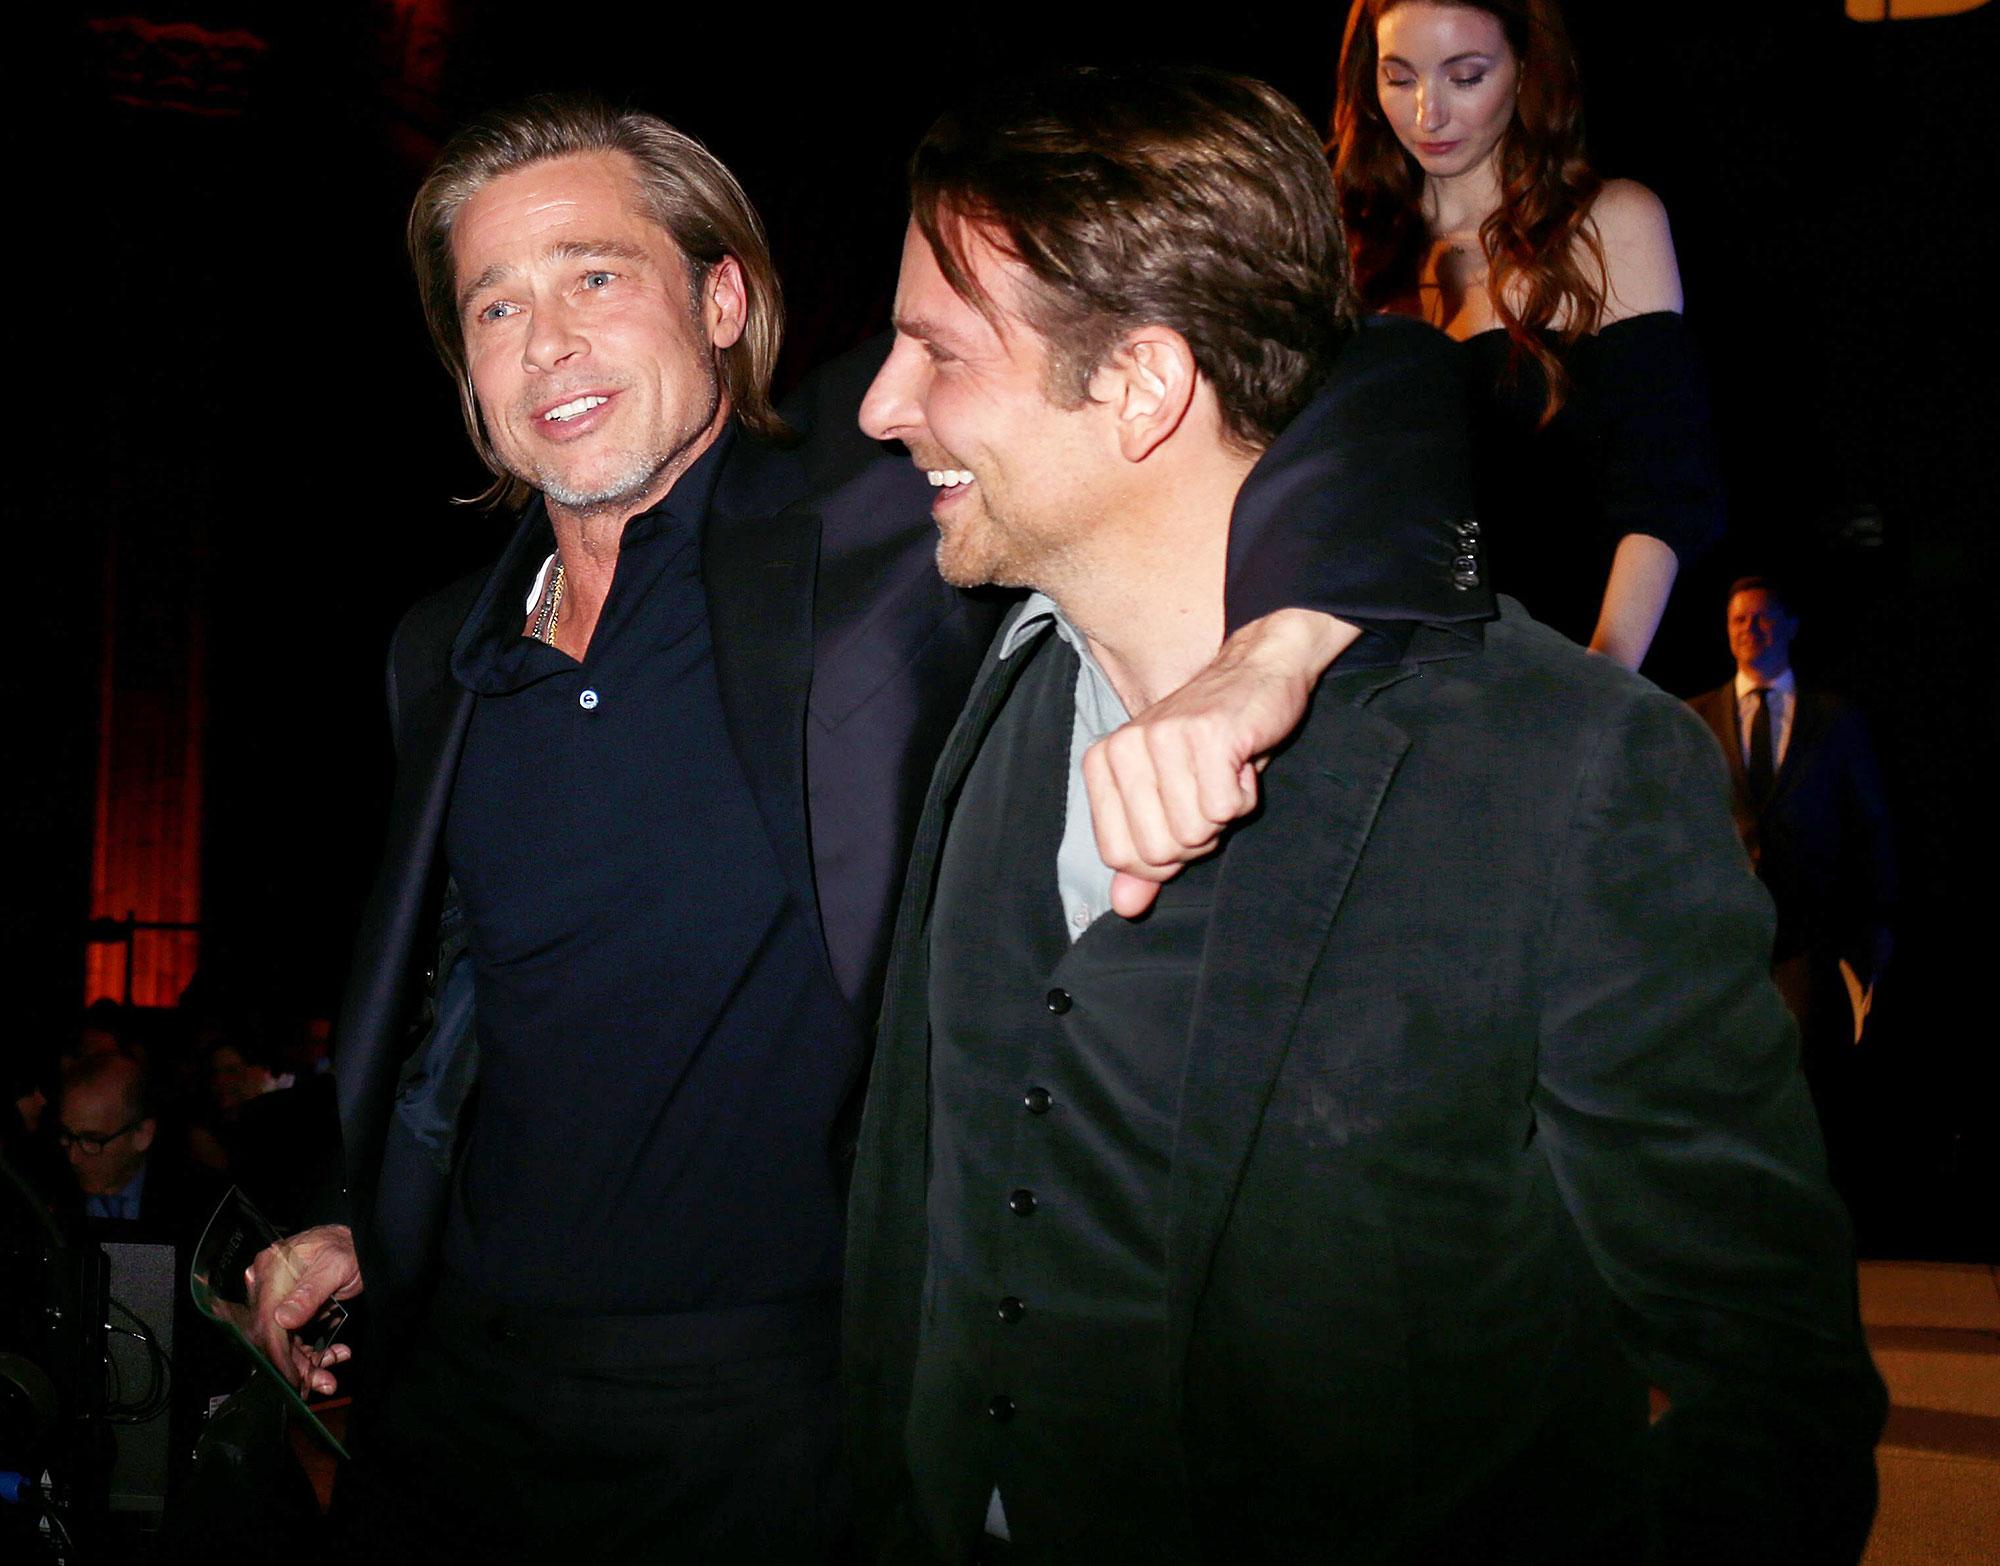 Brad Pitt Credits Bradley Cooper With Helping Him Get Sober